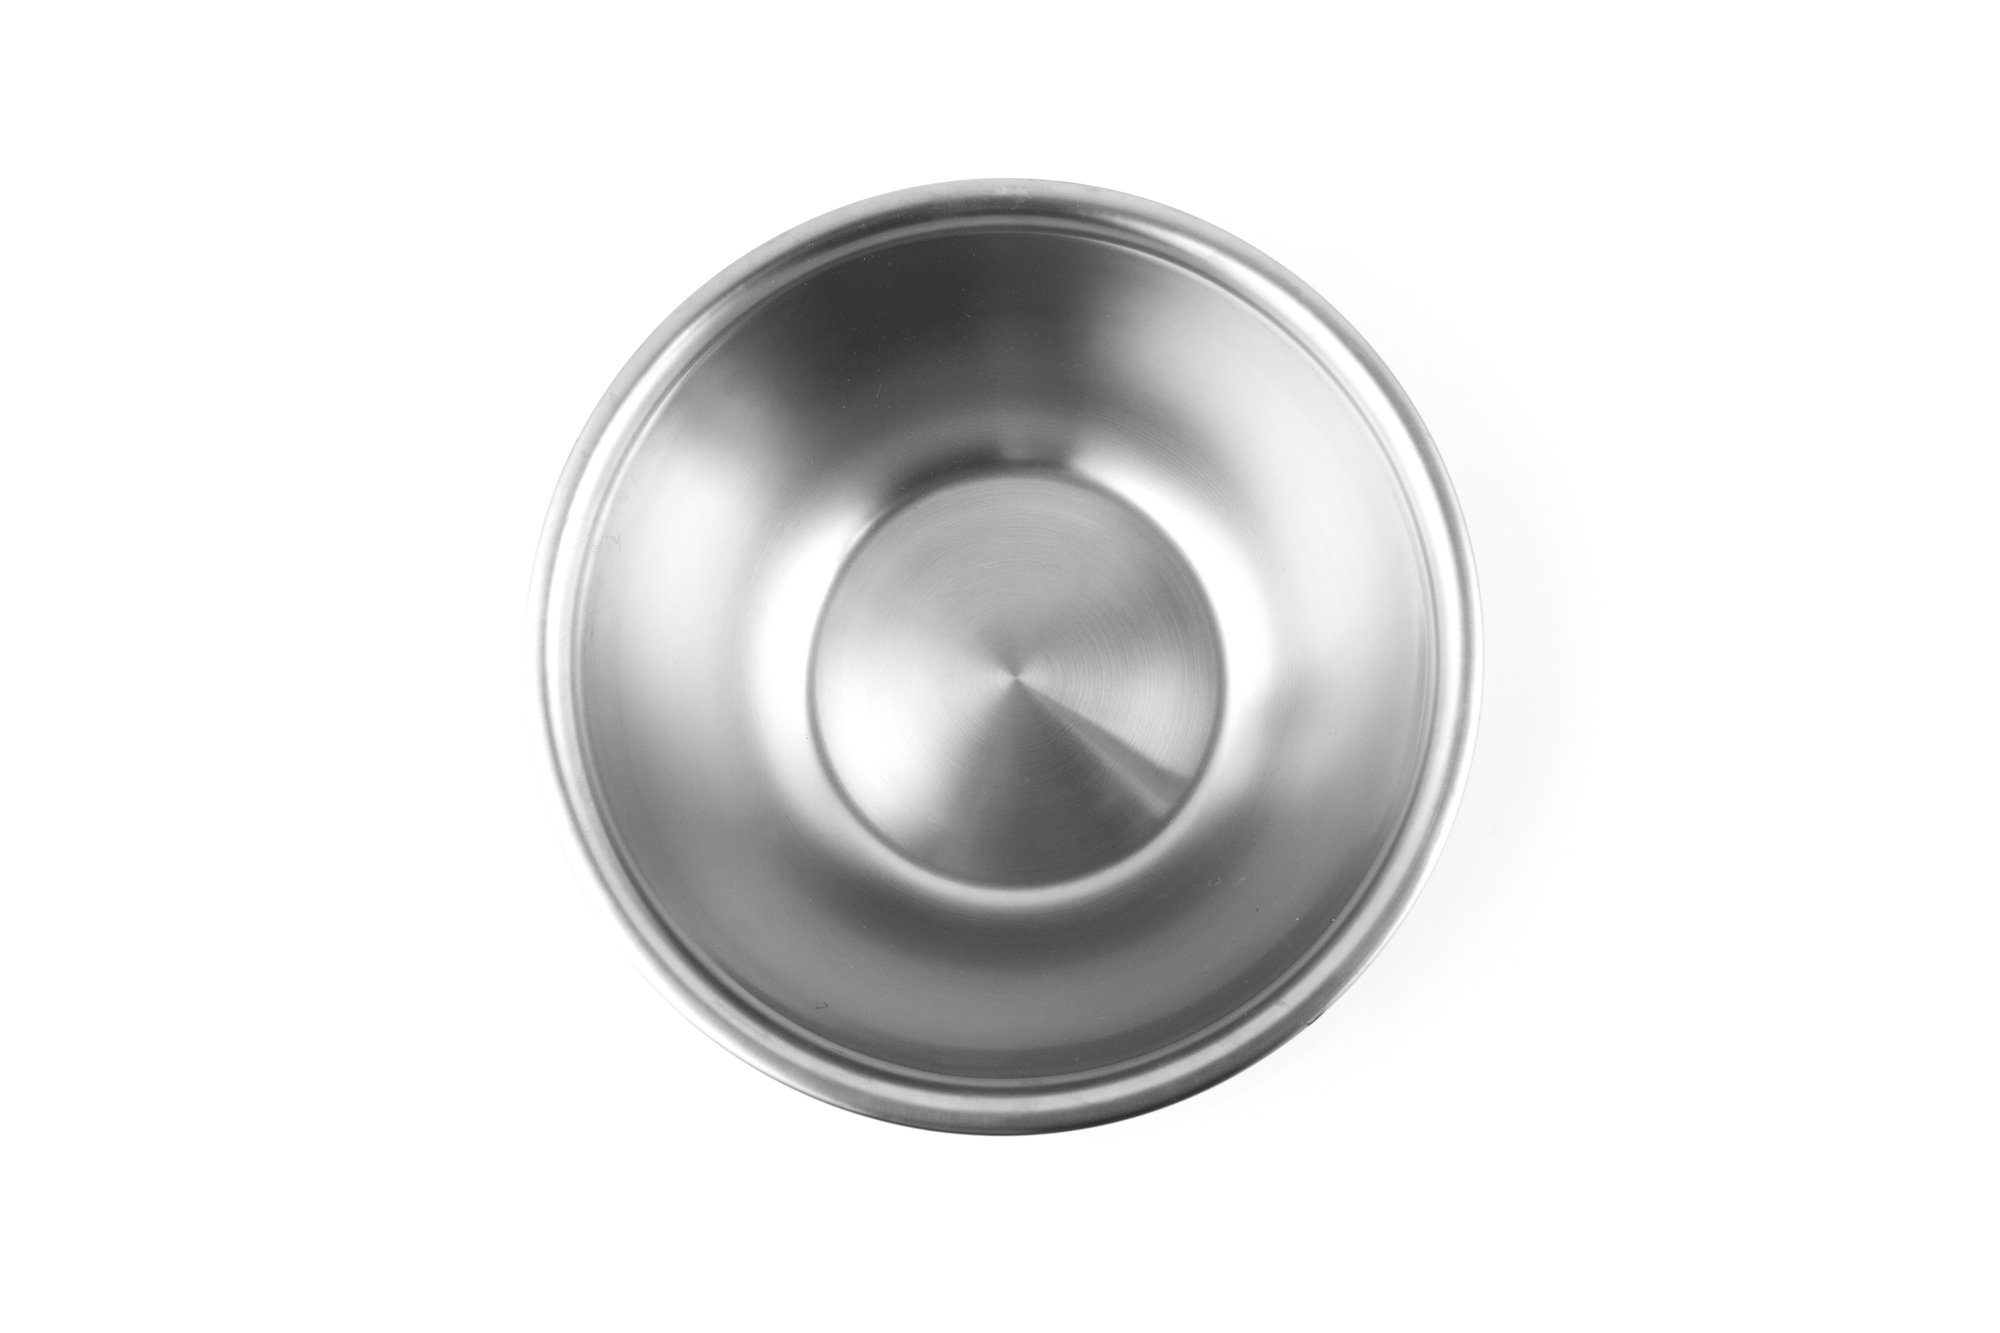 Fox Run 5-Quart Stainless Steel Mixing Bowl by Fox Run (Image #3)